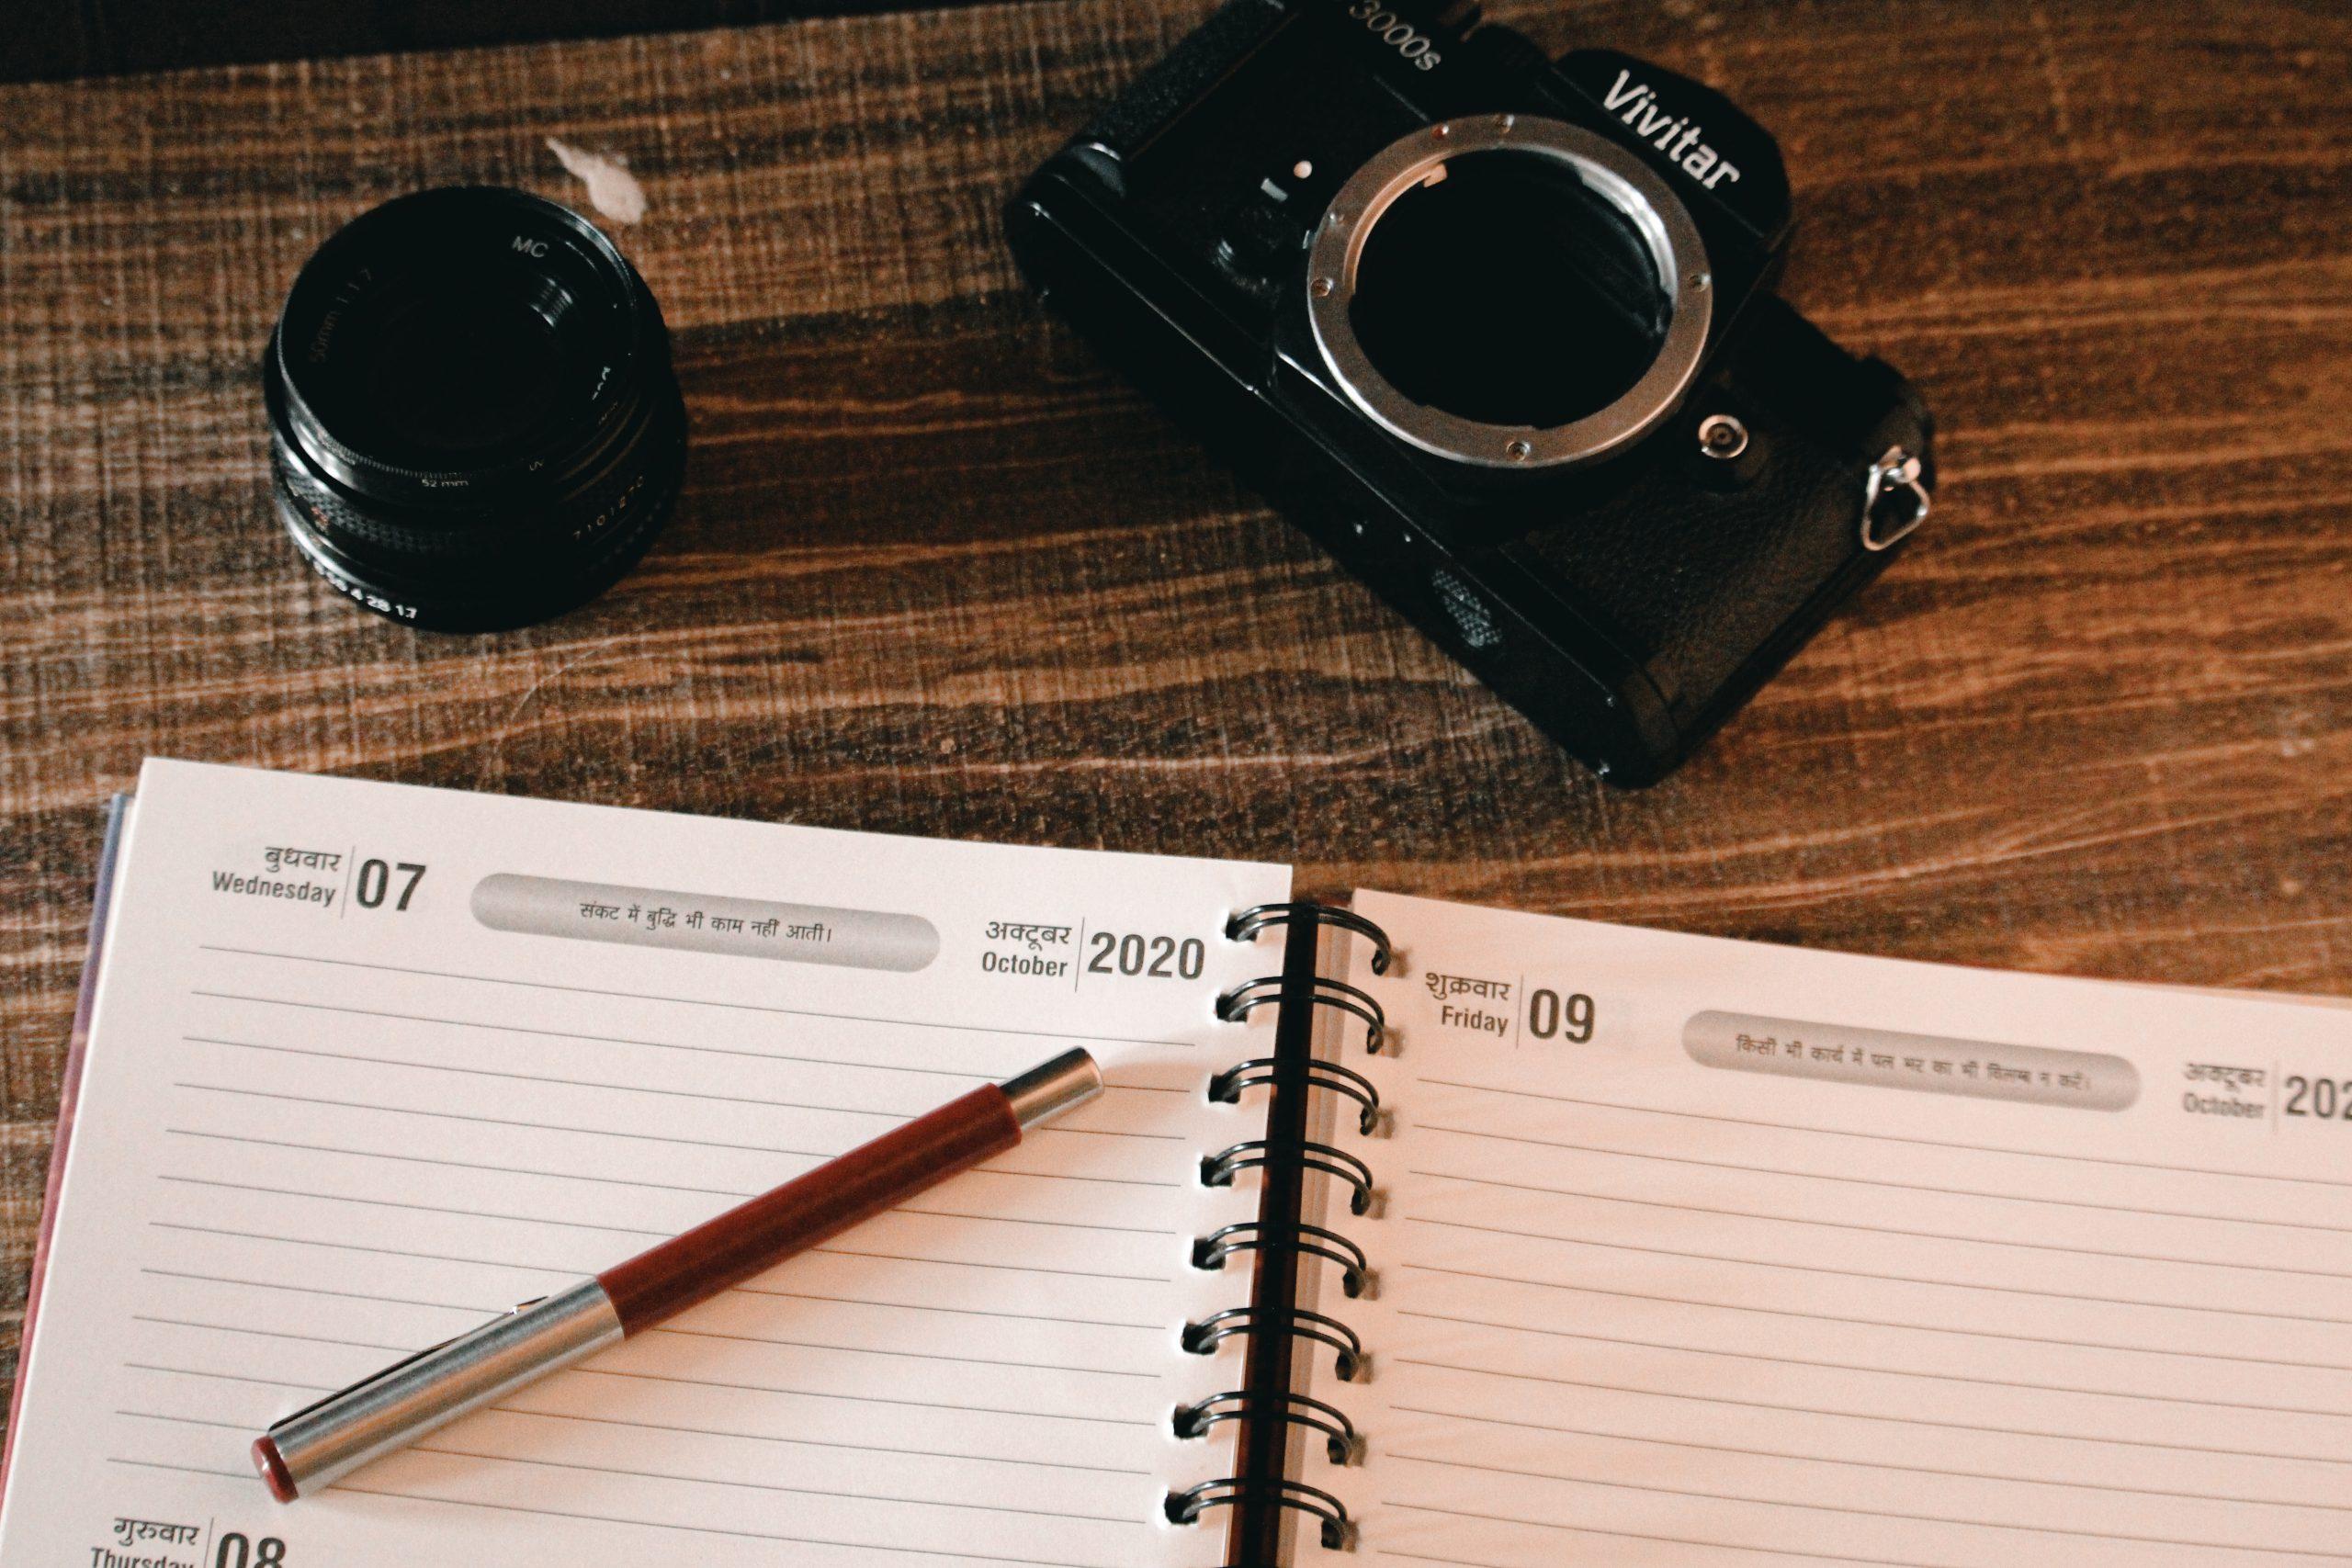 camera and diary